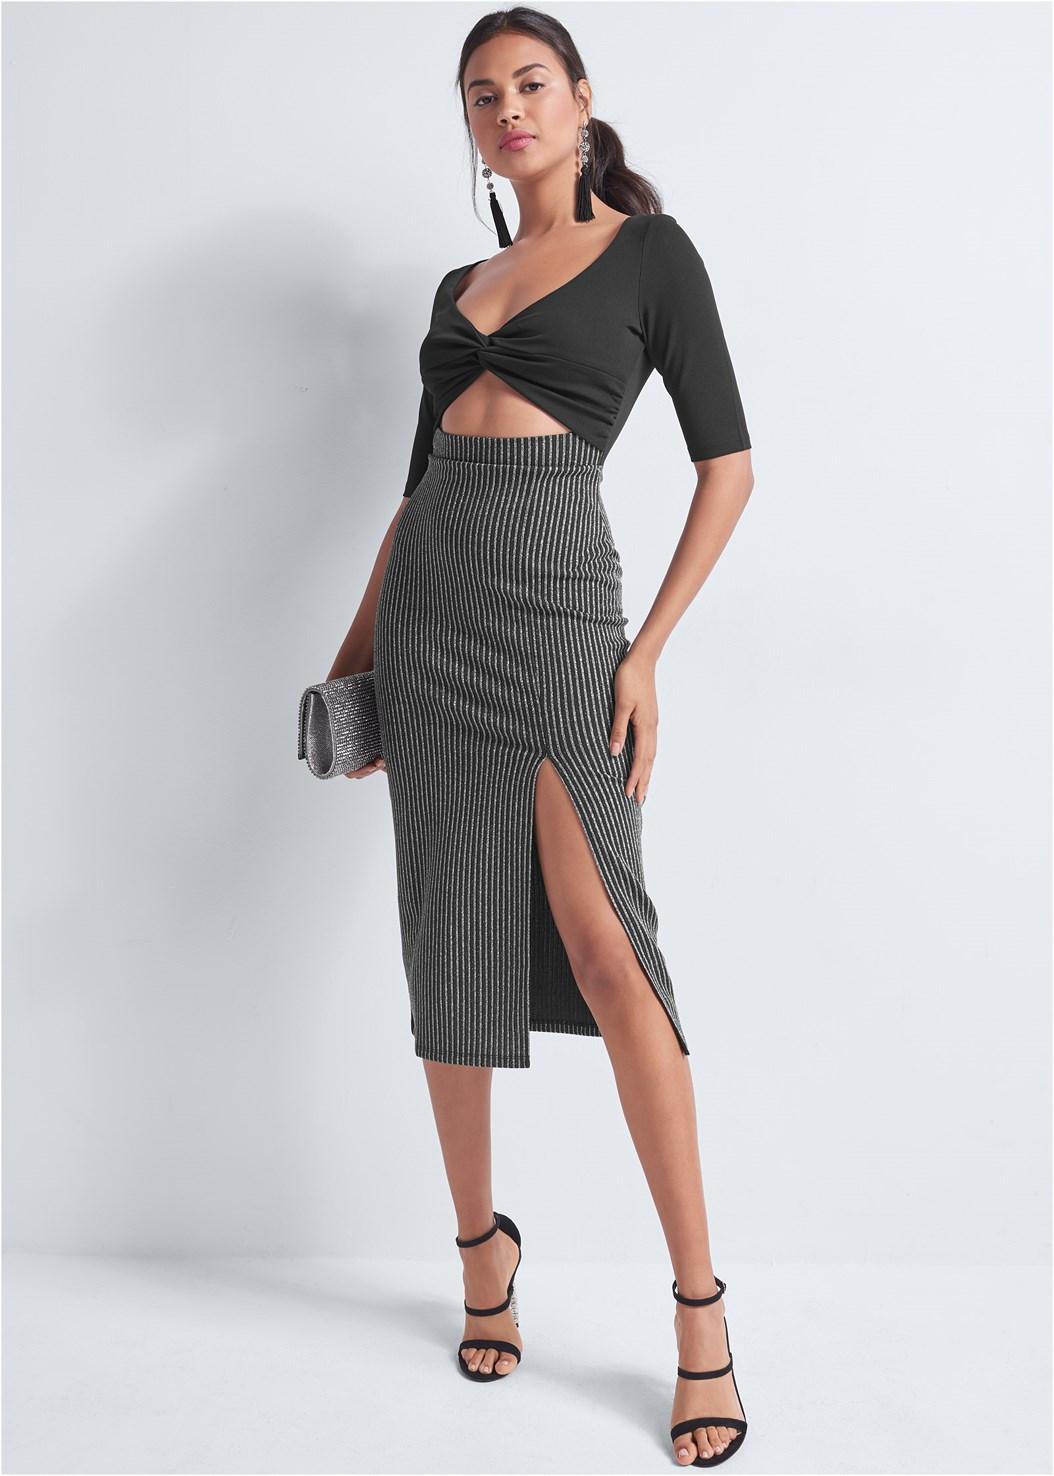 V-Neck Cut Out Dress,Embellished Strappy Heel,Rhinestone Clutch